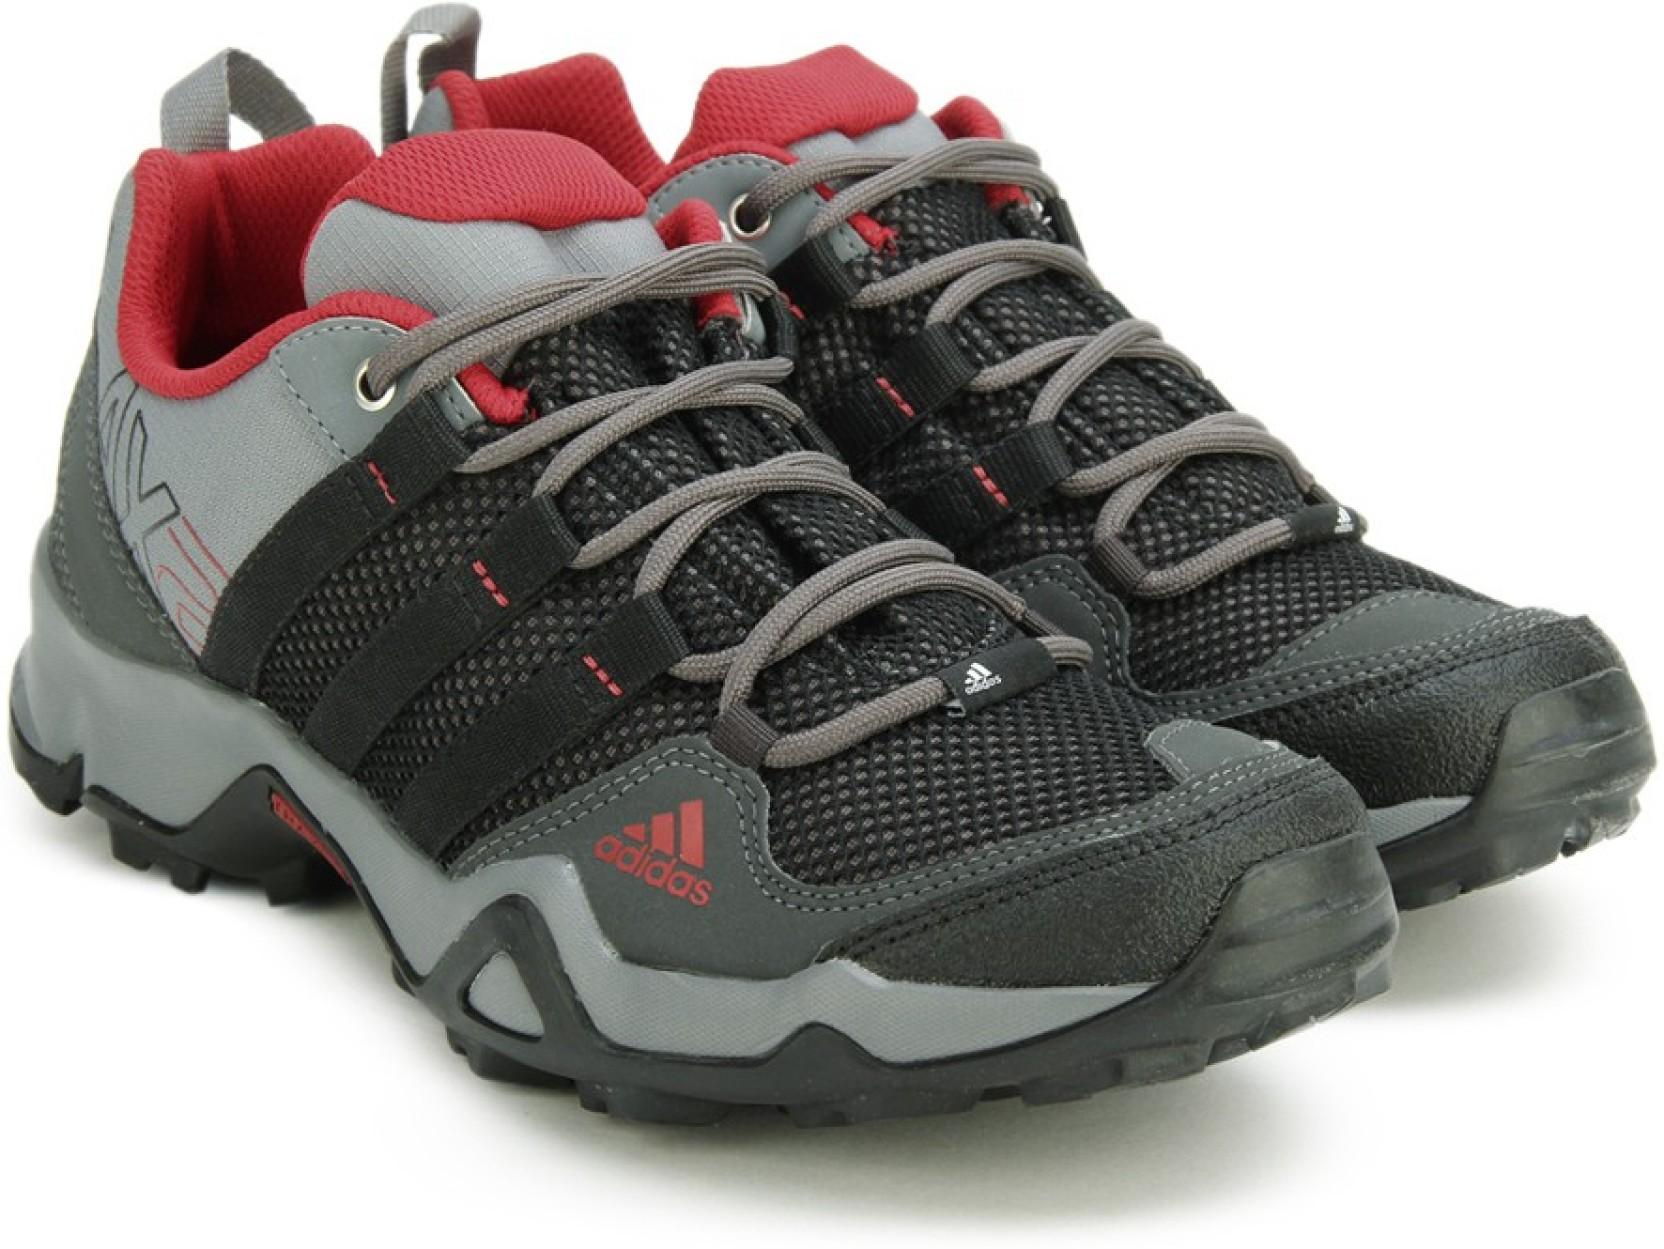 Adidas Ax2 Outdoor Shoes Buy Dgsogr Visgre Black Color